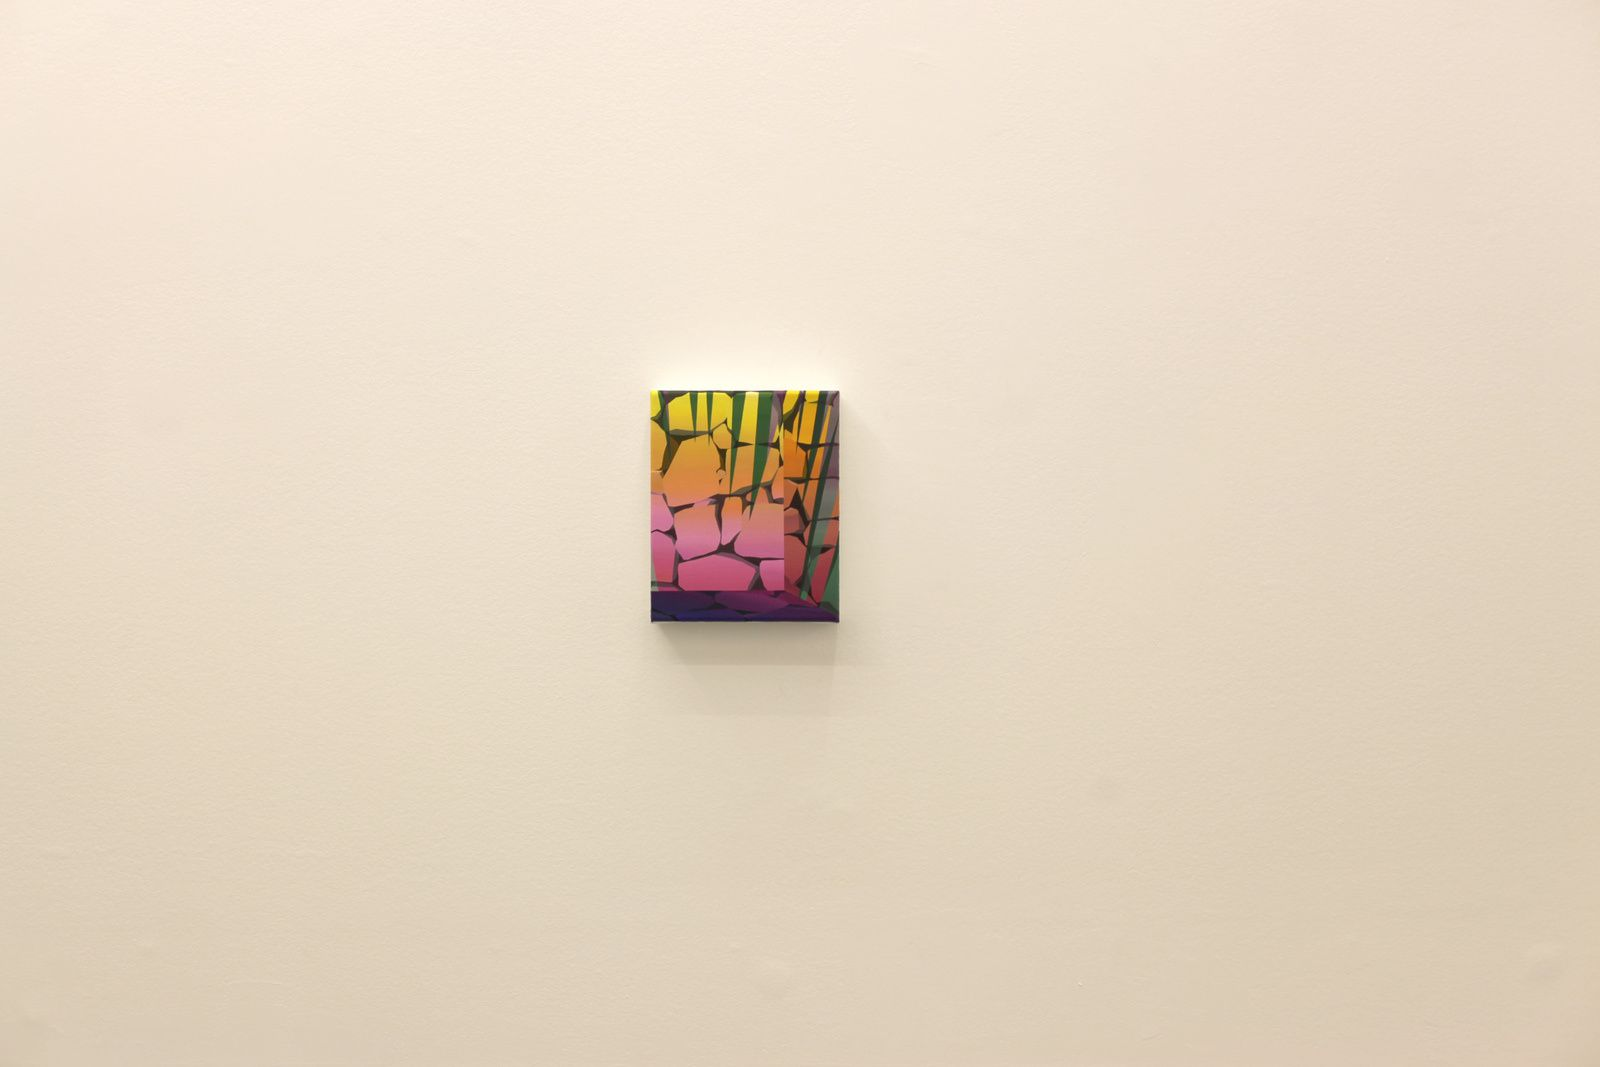 """Burning desire"", 2018 d'Amélie BERTRAND - Courtesy Galerie Semiose © Photo Éric Simon"